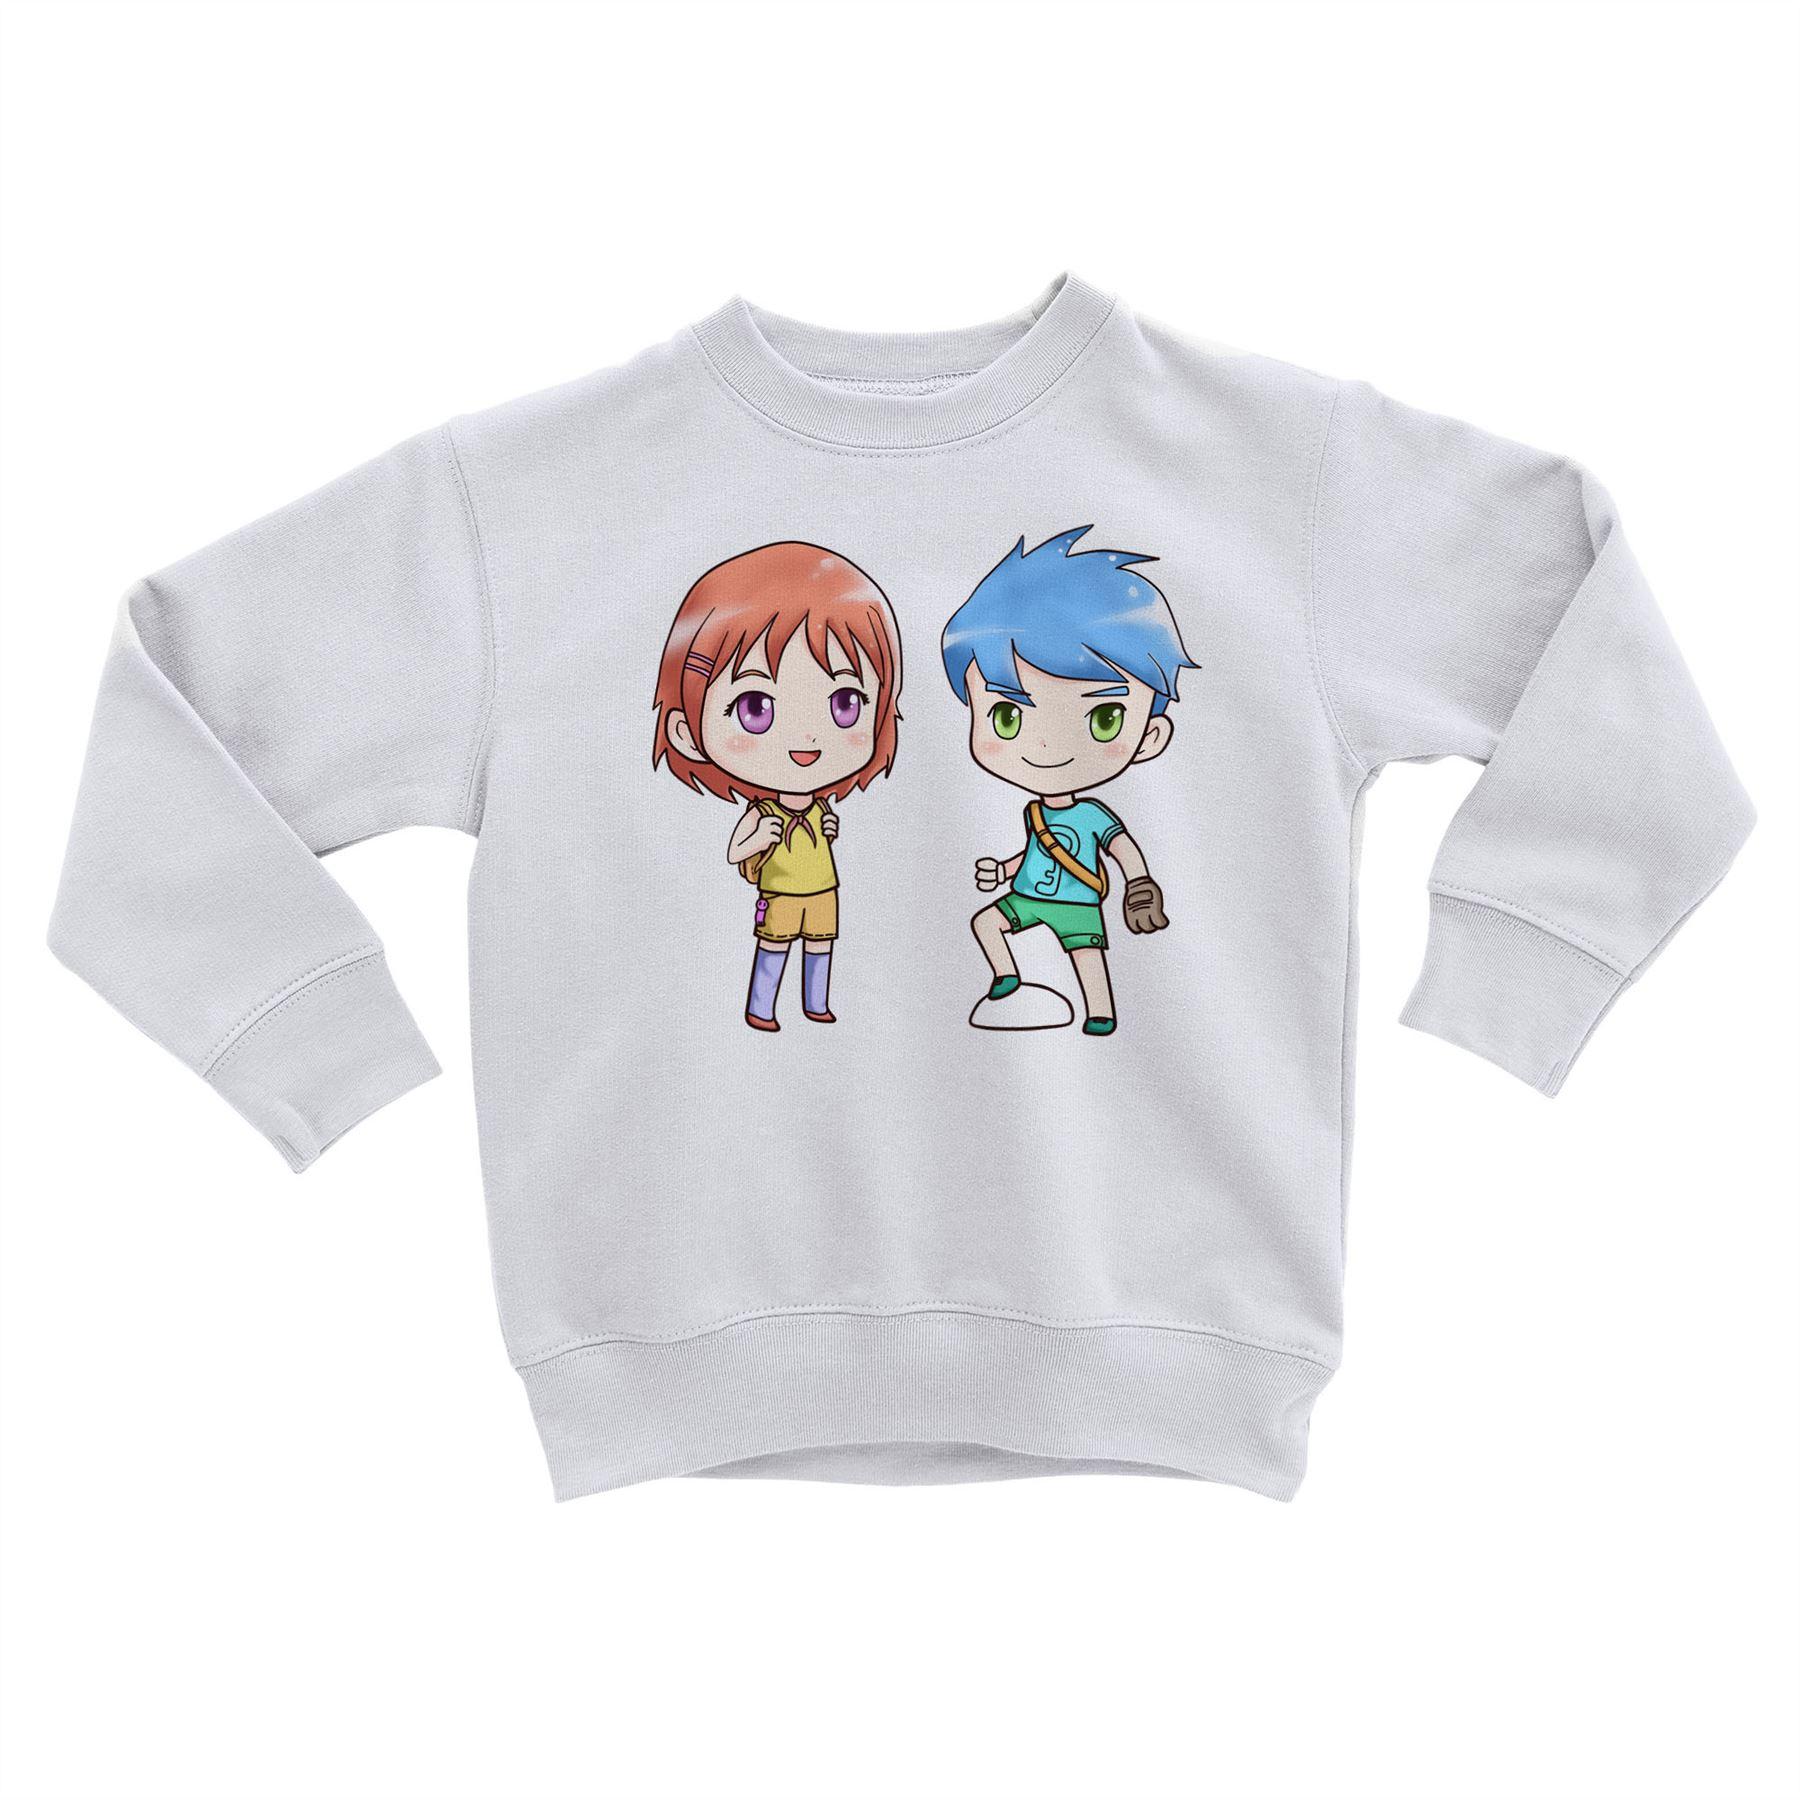 Sweatshirt Enfant Aquarelle Personnage Manga Enfant Mignon Dessin